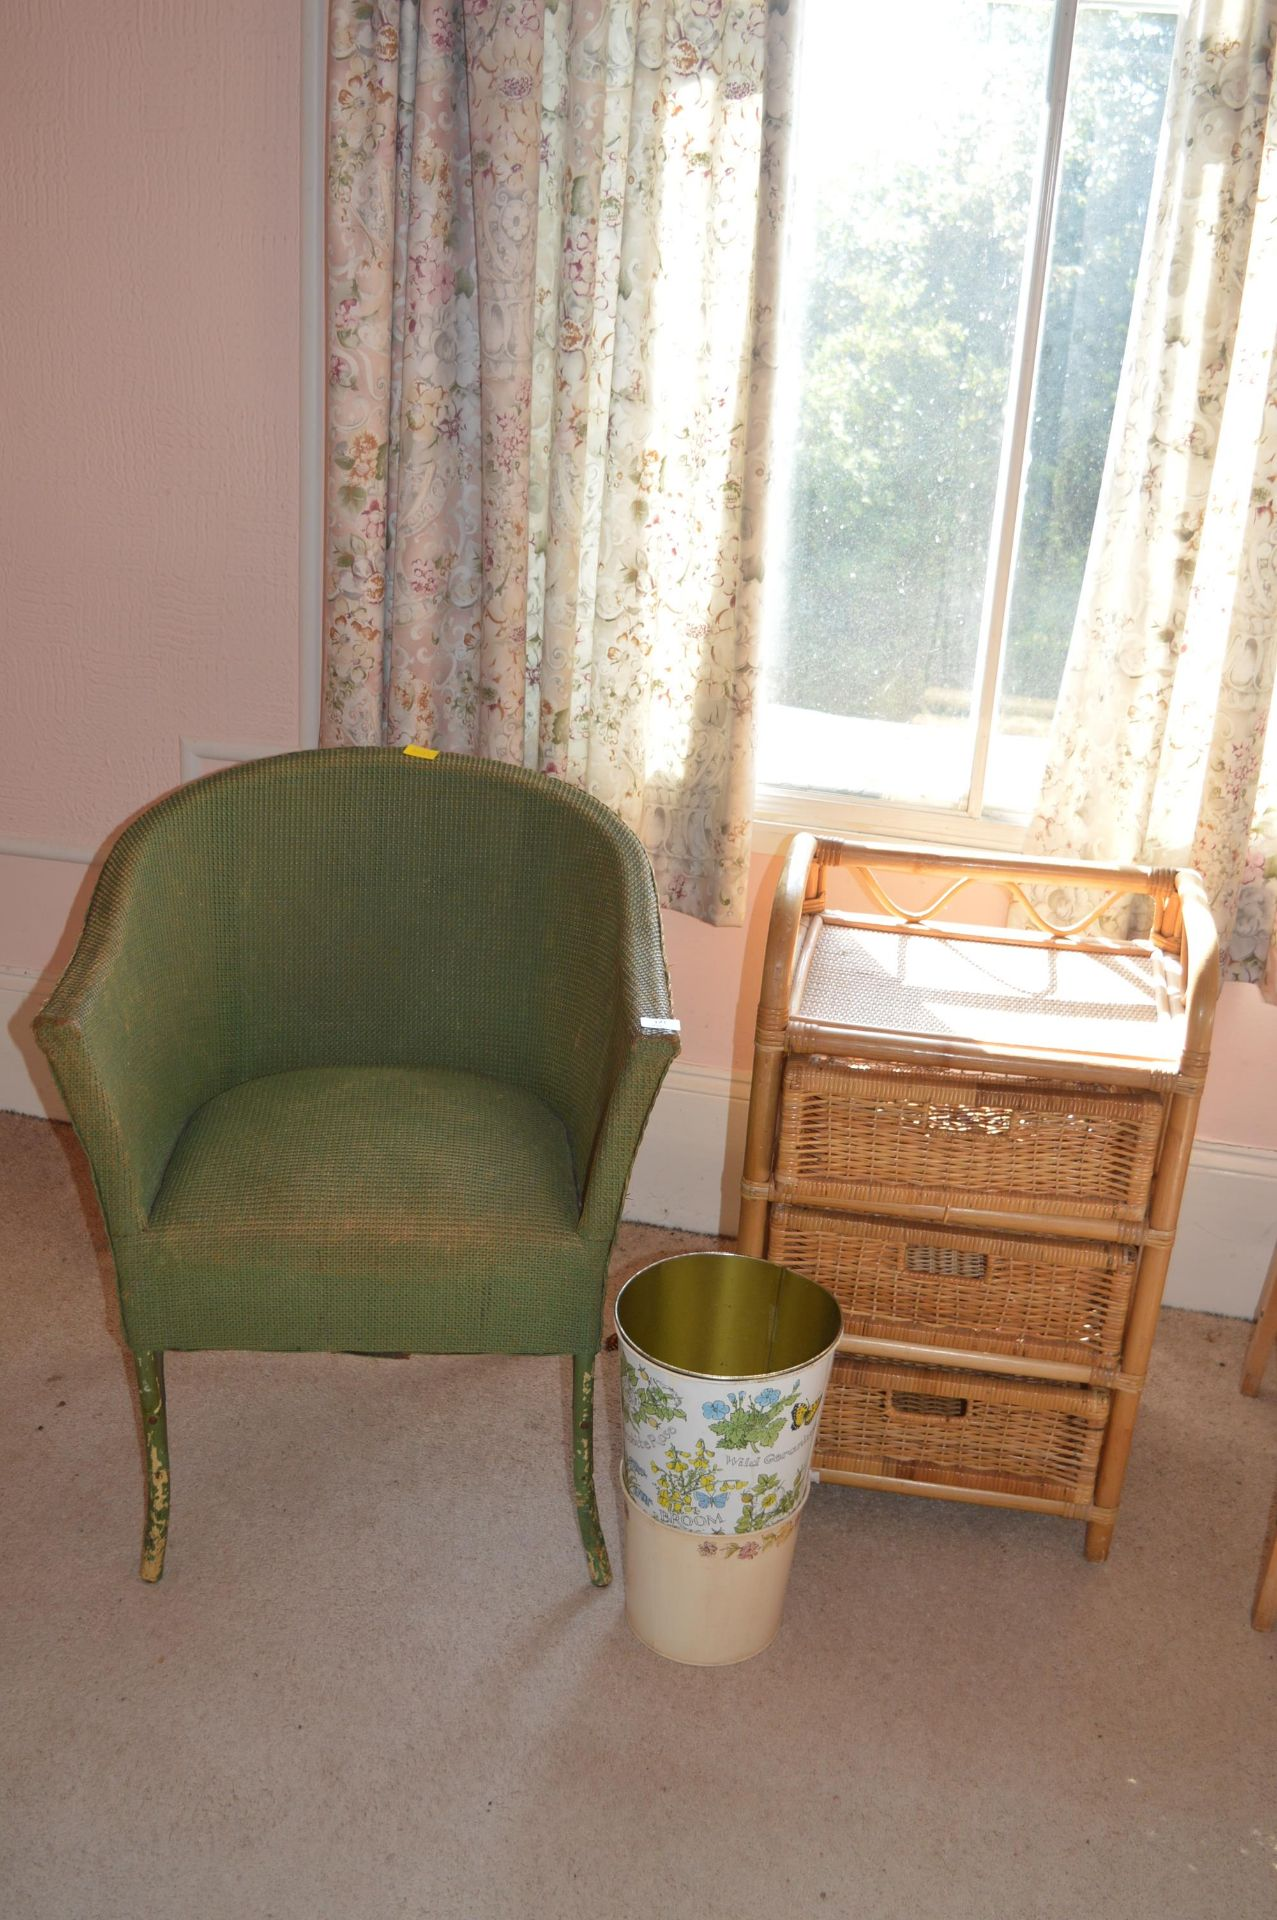 Vintage Lloyd Loom Style Chair, Wicker Shells, and Waste Paper Bins